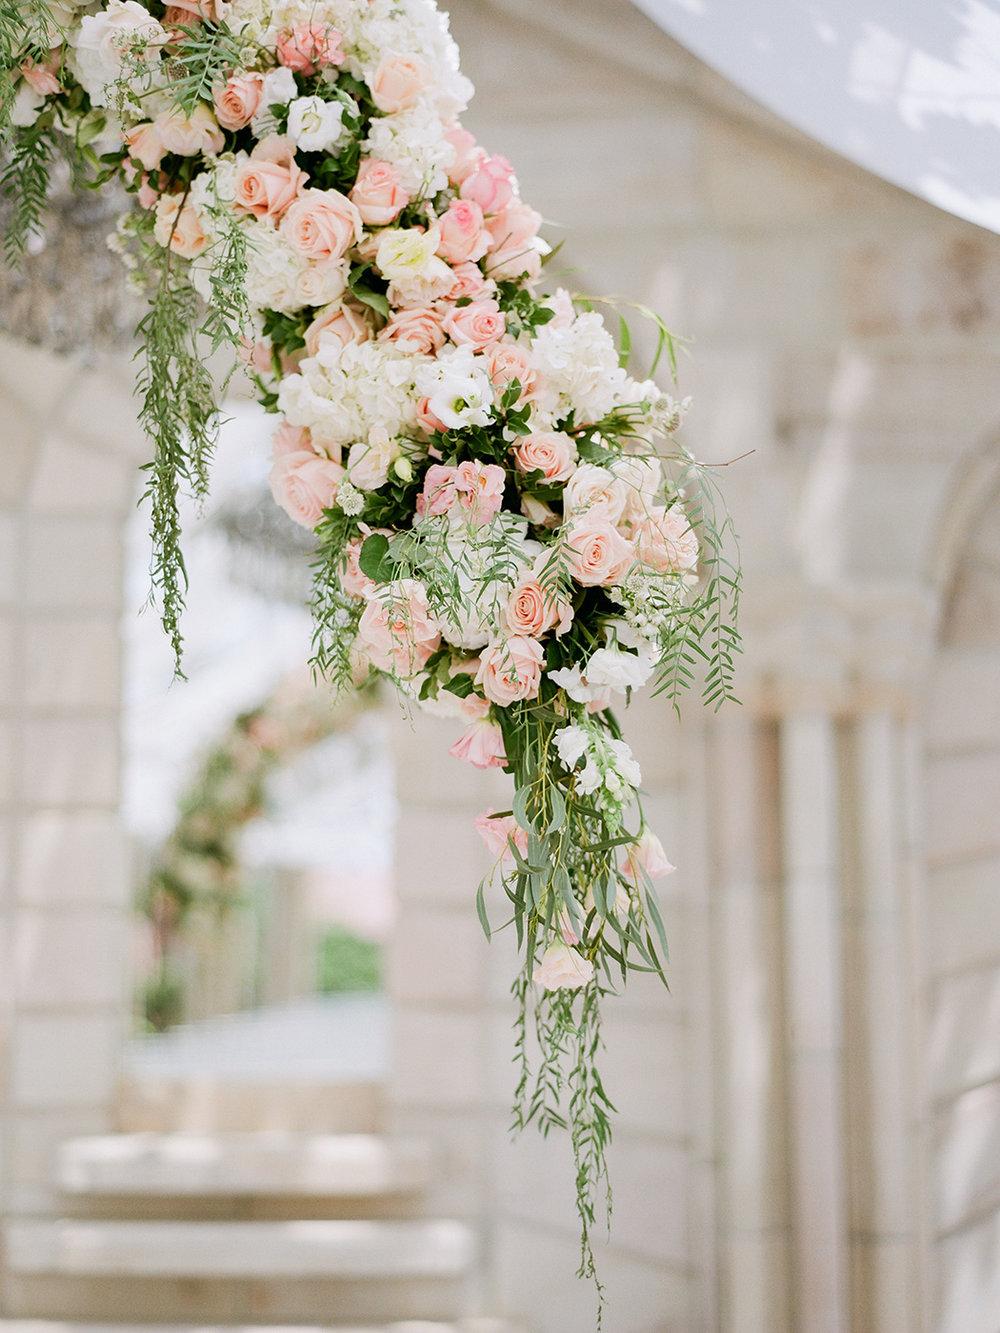 Floating Floral Arch Arrangement | Rensche Mari Photography